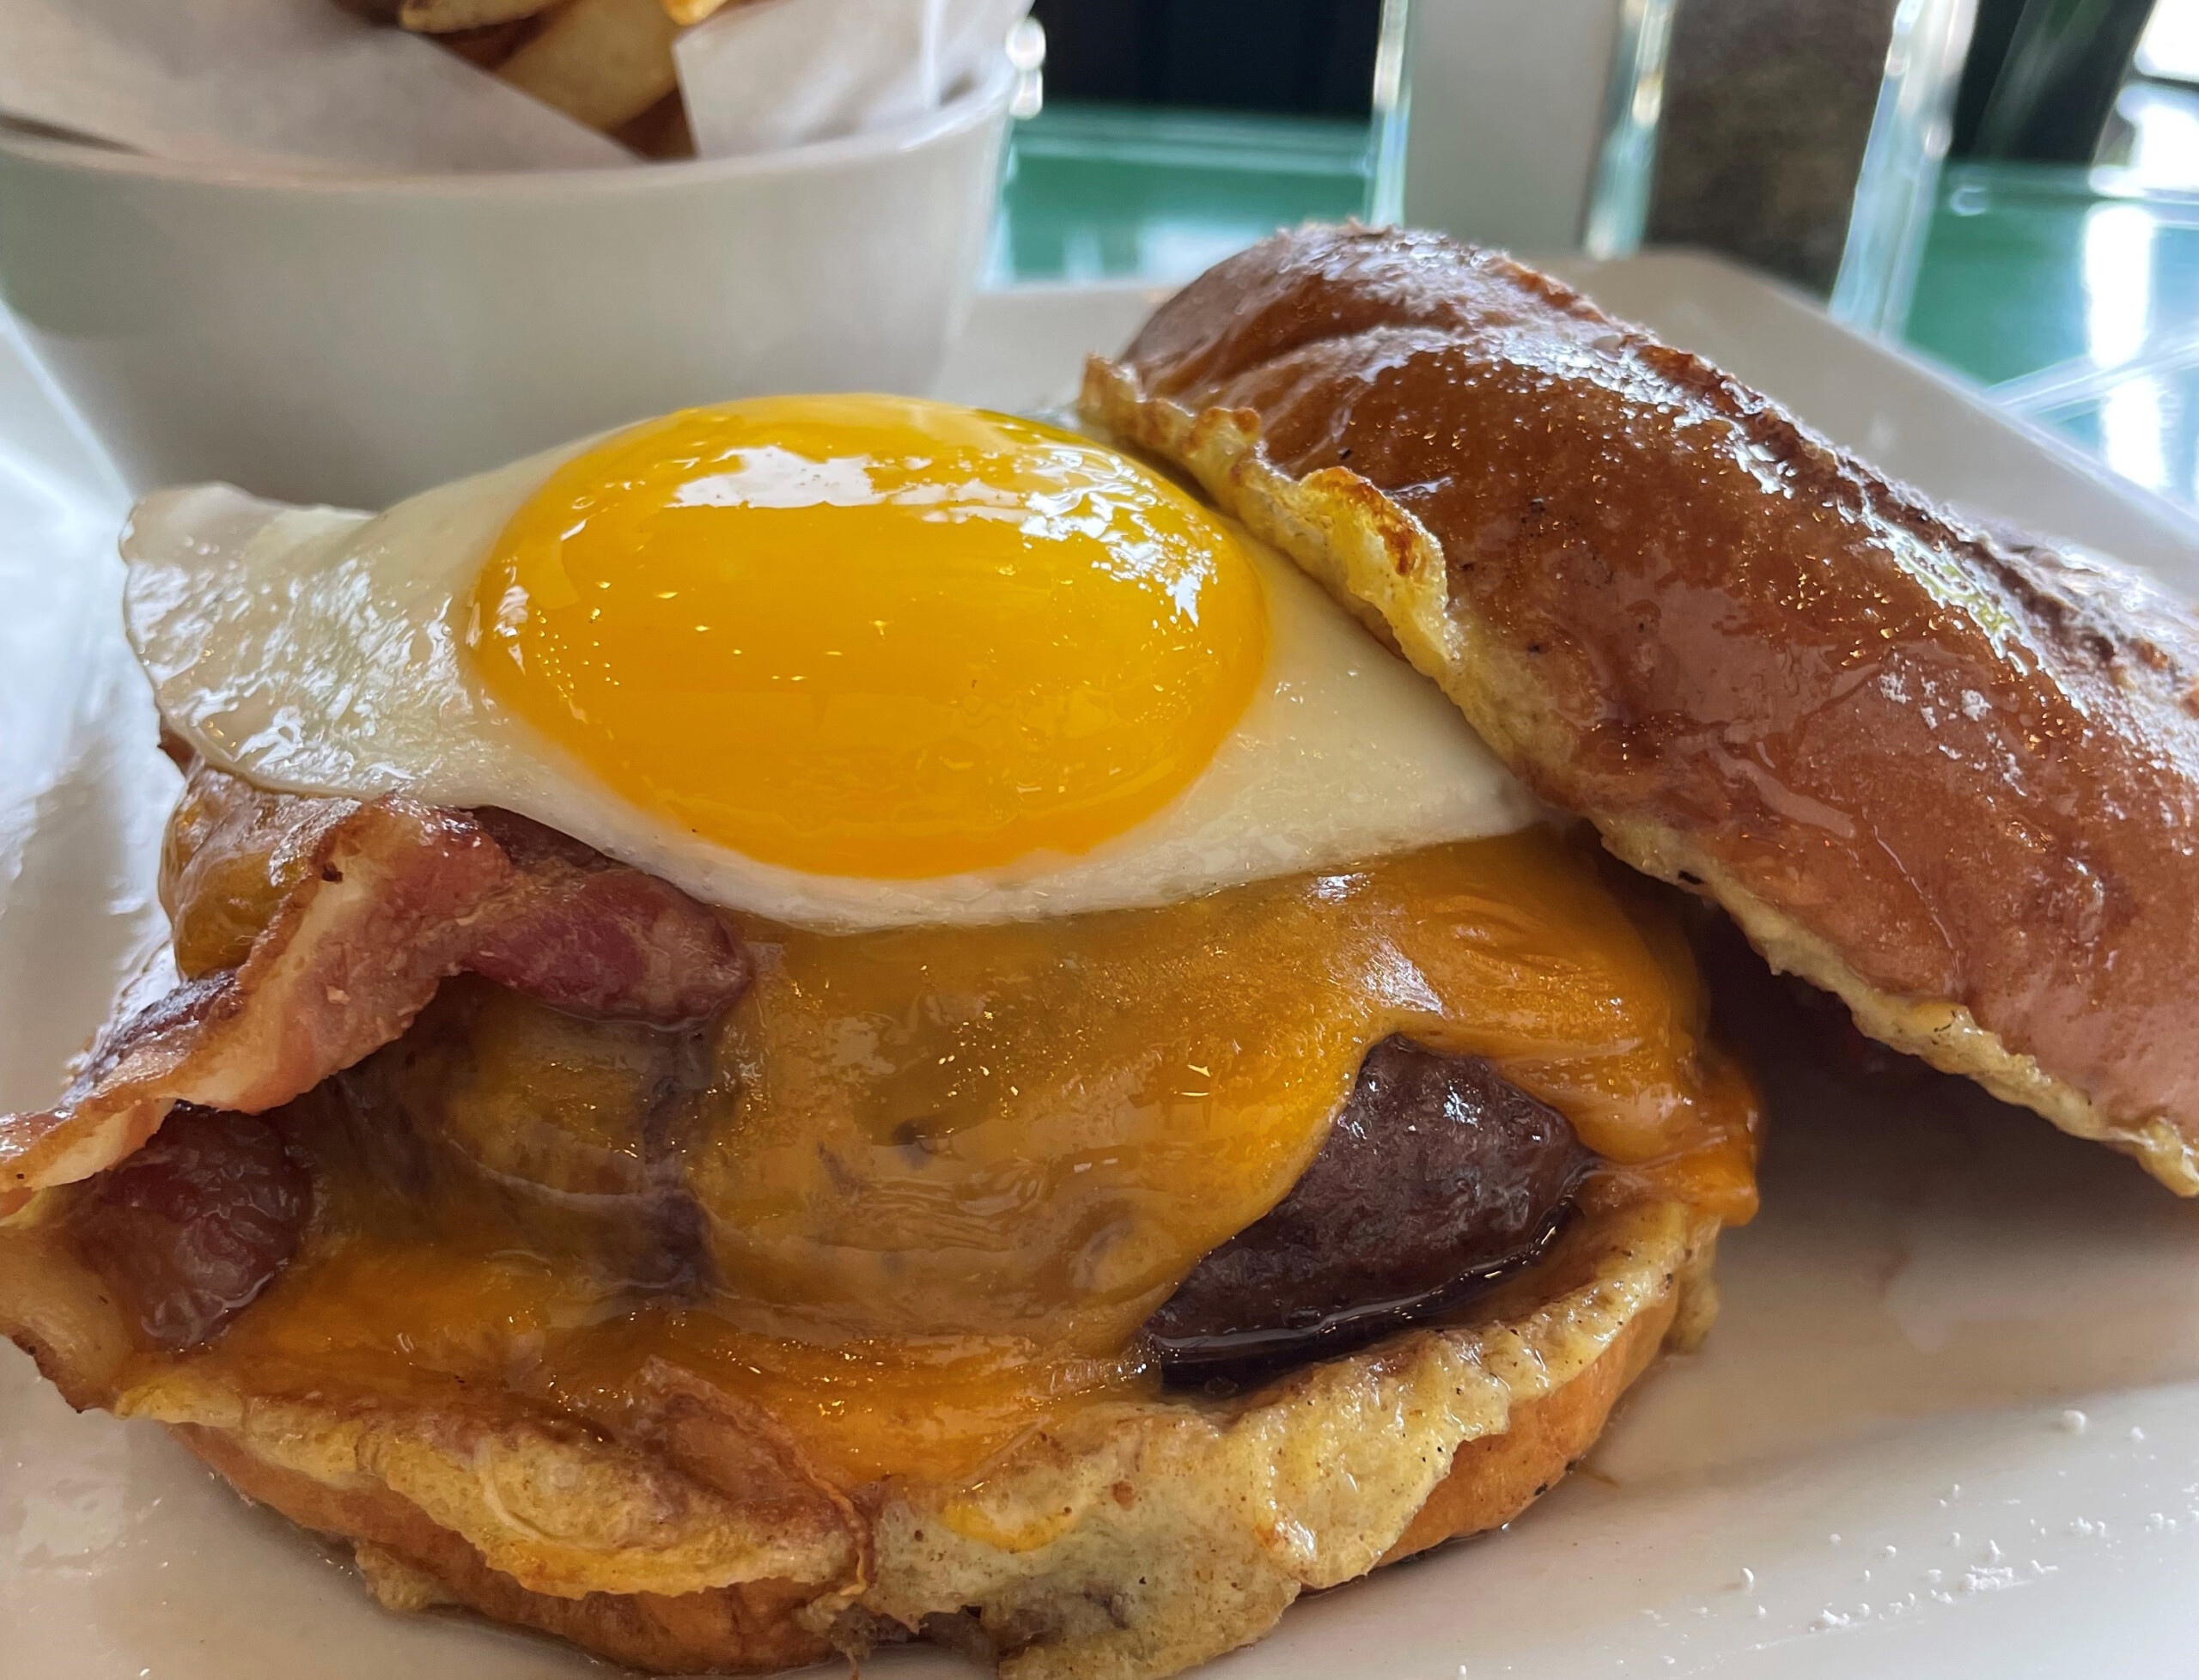 The Hangover Burger